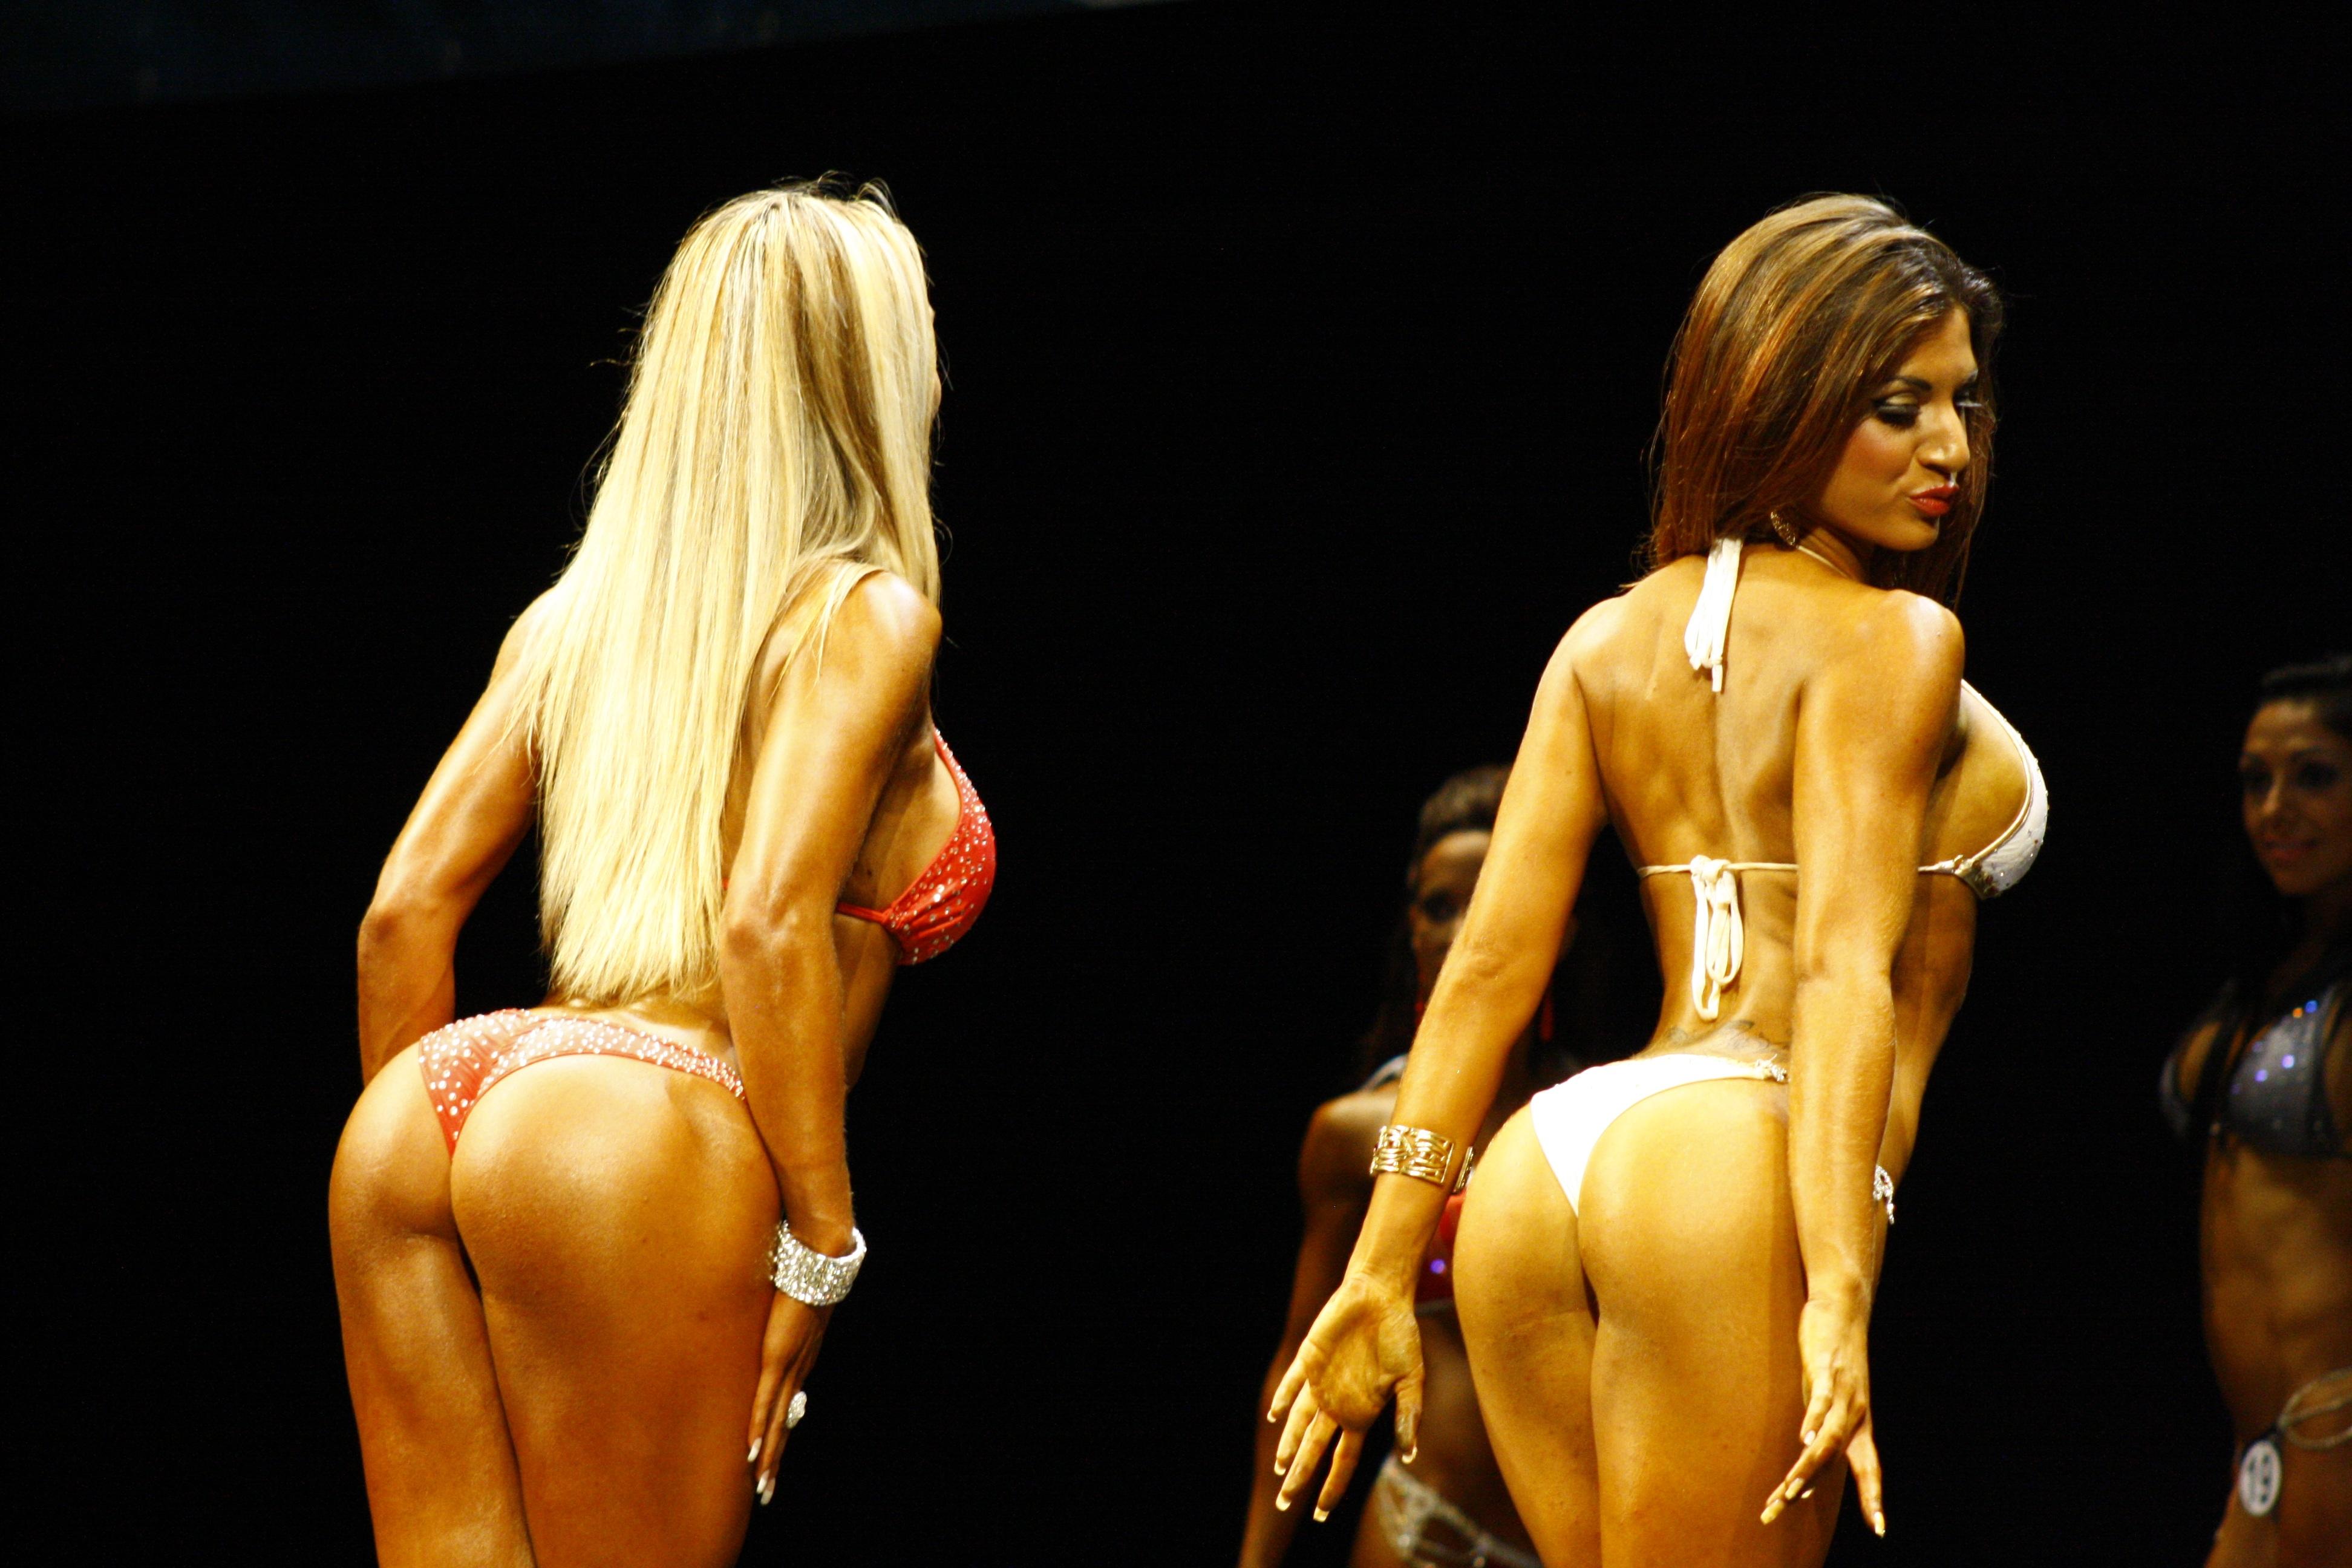 figure competitor erotics lead